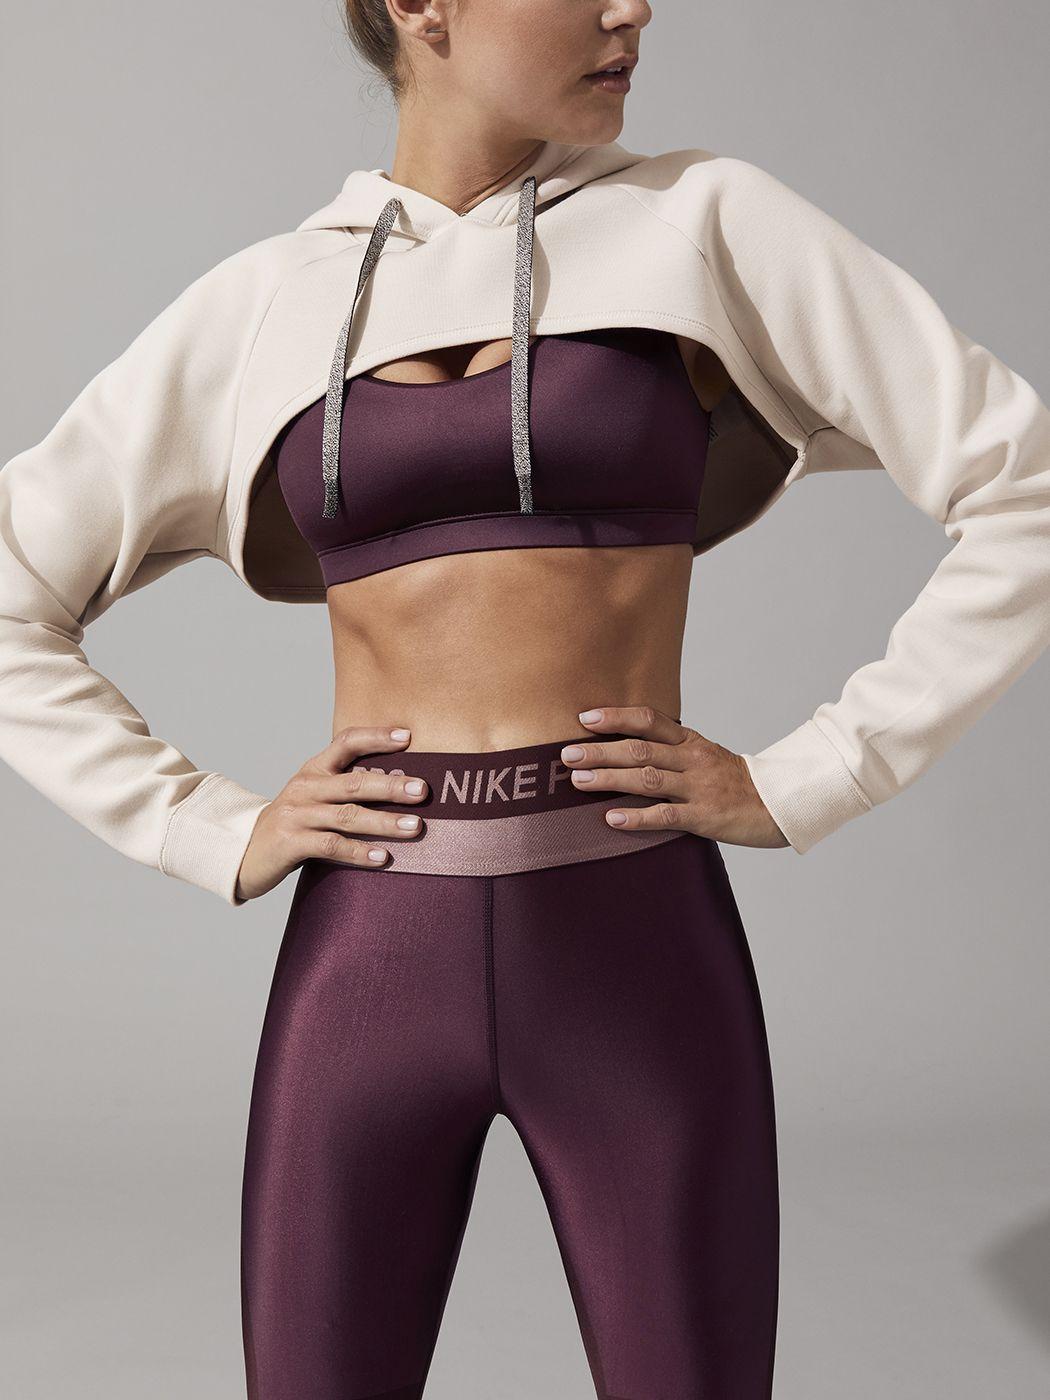 W Nk Dry Shrug Sweatshirts In Desert Sand Black By Nike From Carbon38 Sports Wear Fashion Sportswear Fashion Cute Workout Outfits [ 1400 x 1050 Pixel ]